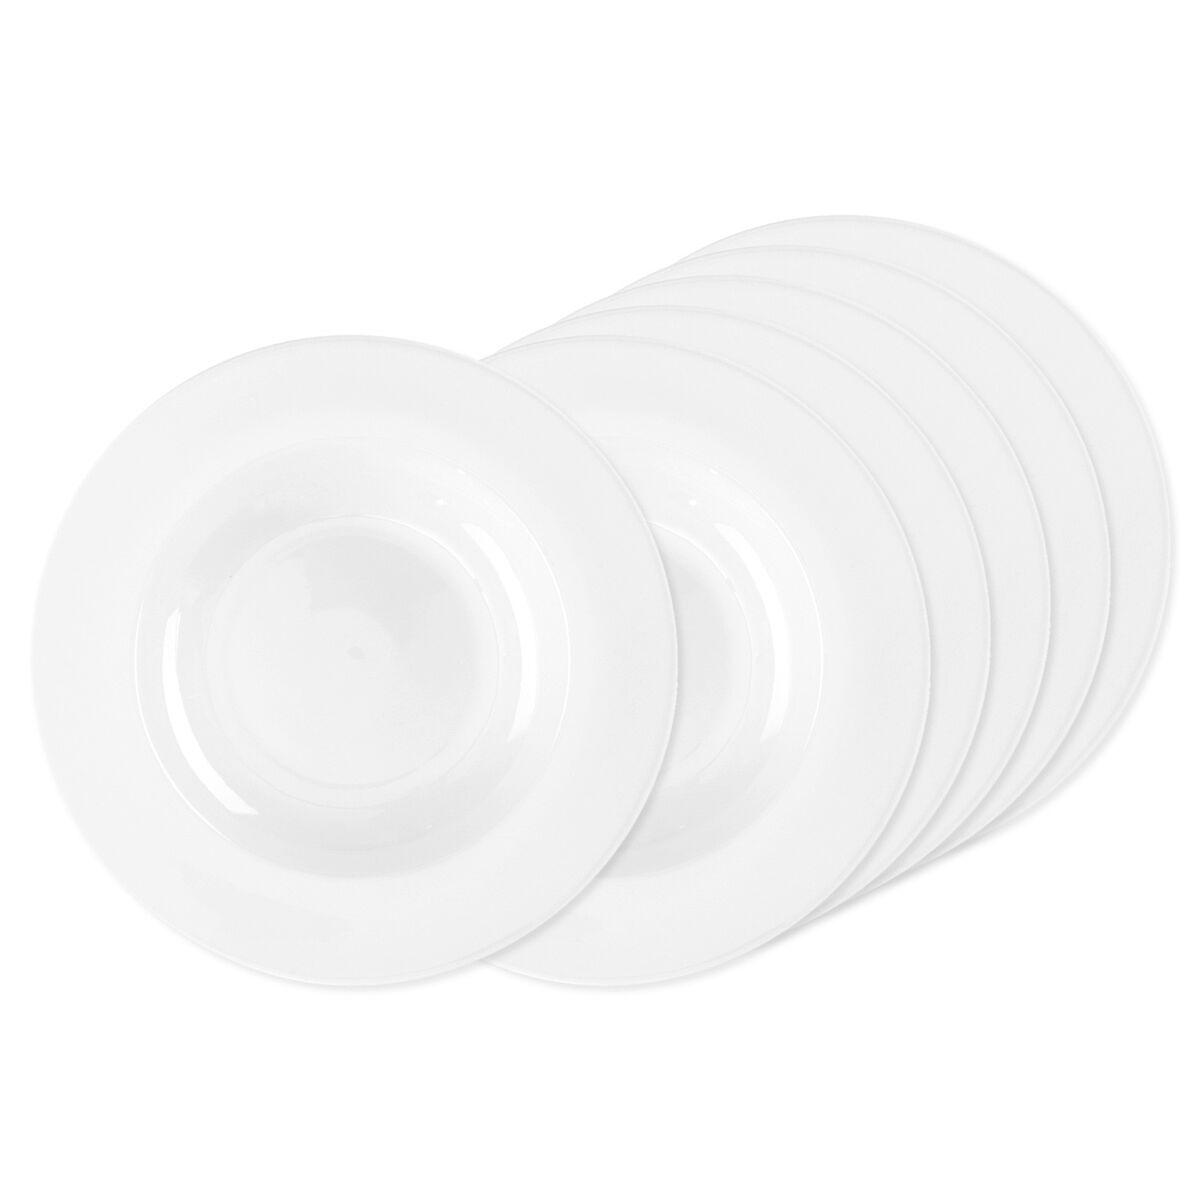 Teller tief La Vie Porzellan ca D22cm, weiß  Depot DE ~ Geschirr La Vie